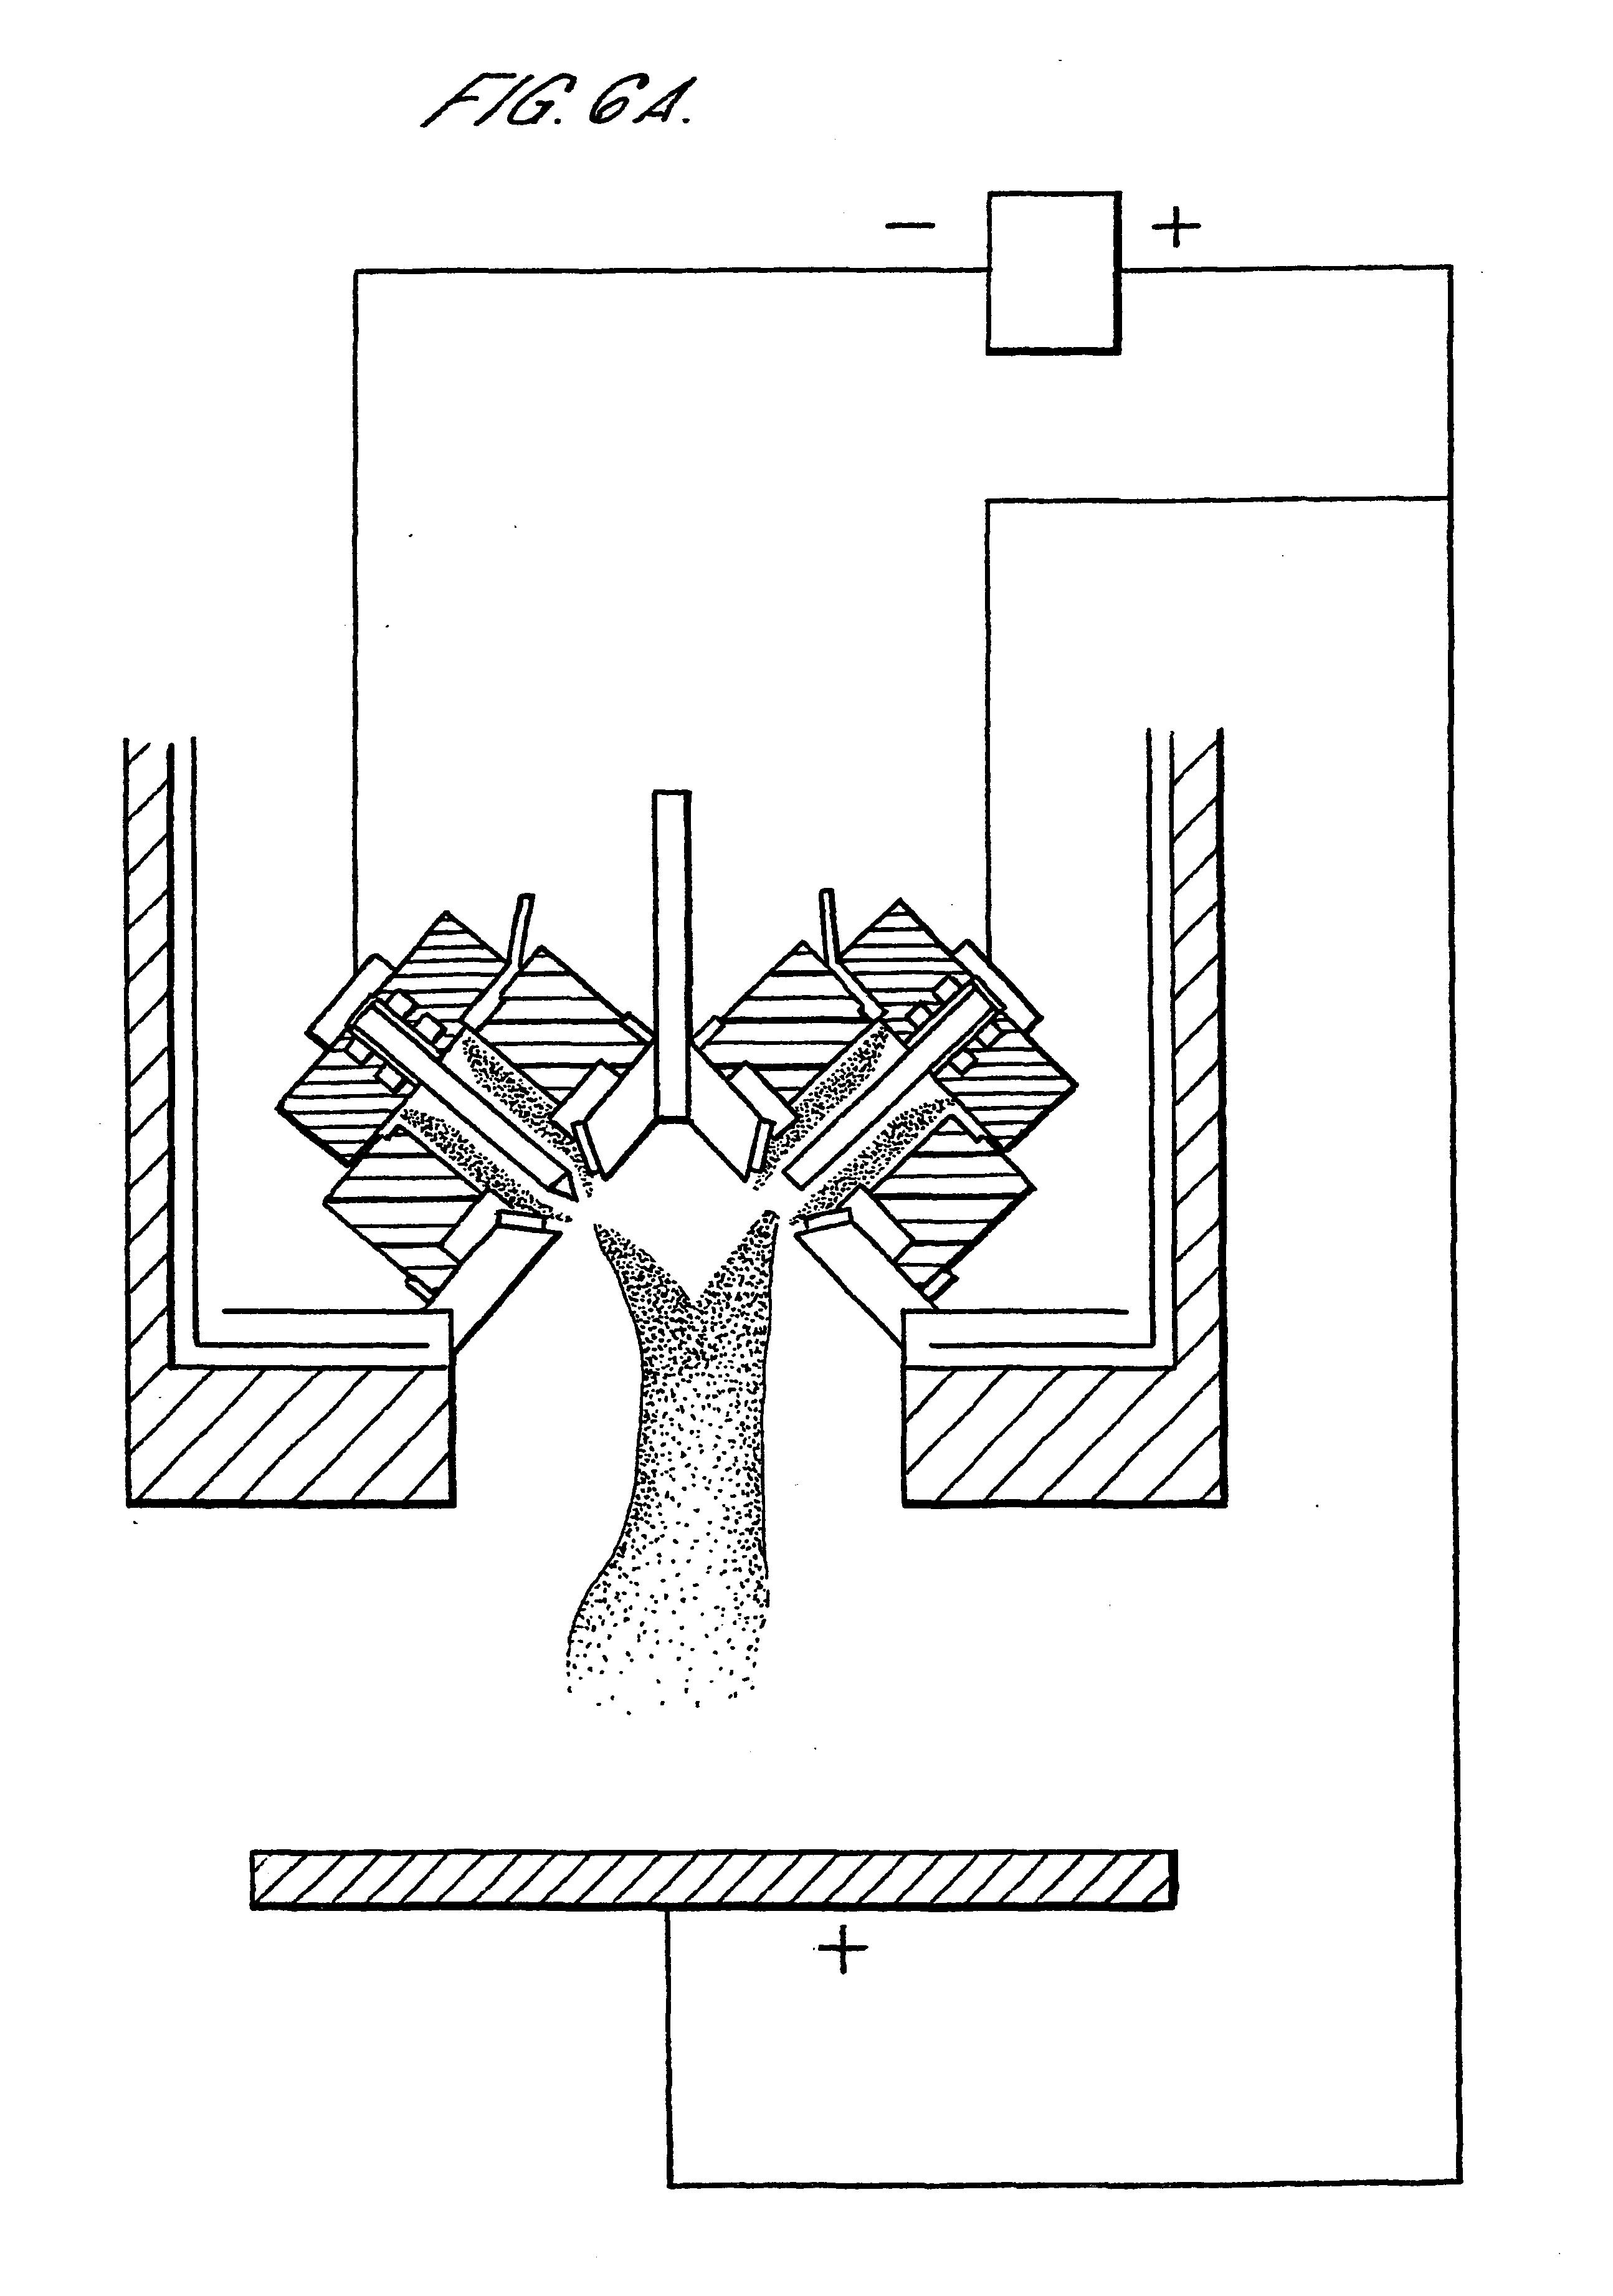 Image of the Plasma Vitrification Technology designed for the treatment of ILW